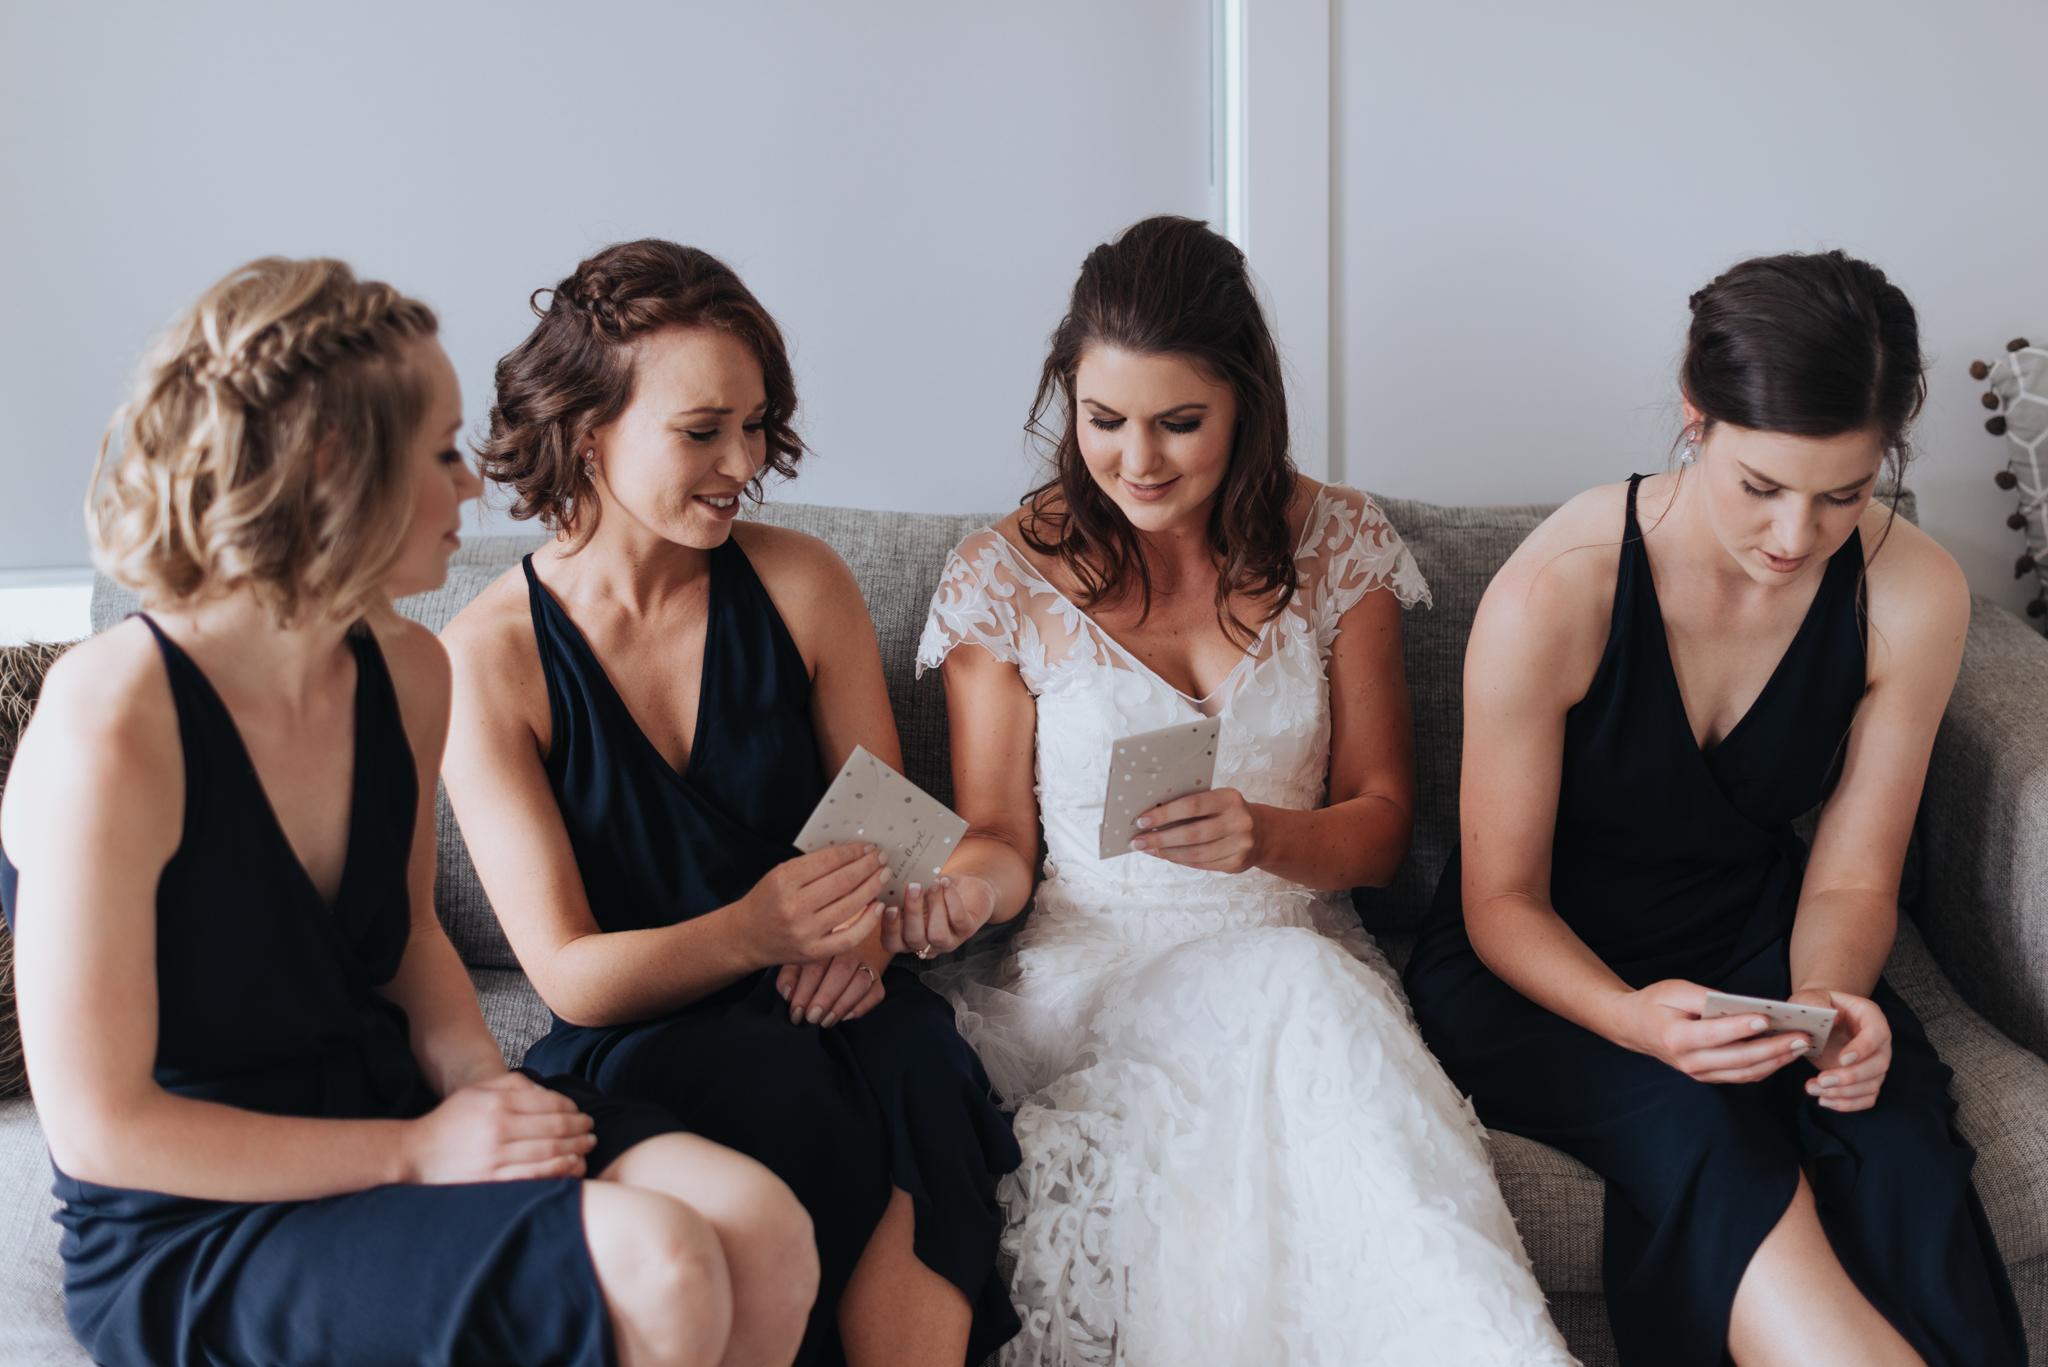 LOVELENSCAPES PHOTOGRAPHY • VISUAL POETRY • NEW ZEALAND WEDDING PHOTOGRAPHER • AUSTRALIAN WEDDING PHOTOGRAPHER • BRISBANE • MELBOURNE • SYDNEY • HOBART • TARUREKA ESTATE • ANNA CAMPBELL • 65.jpg